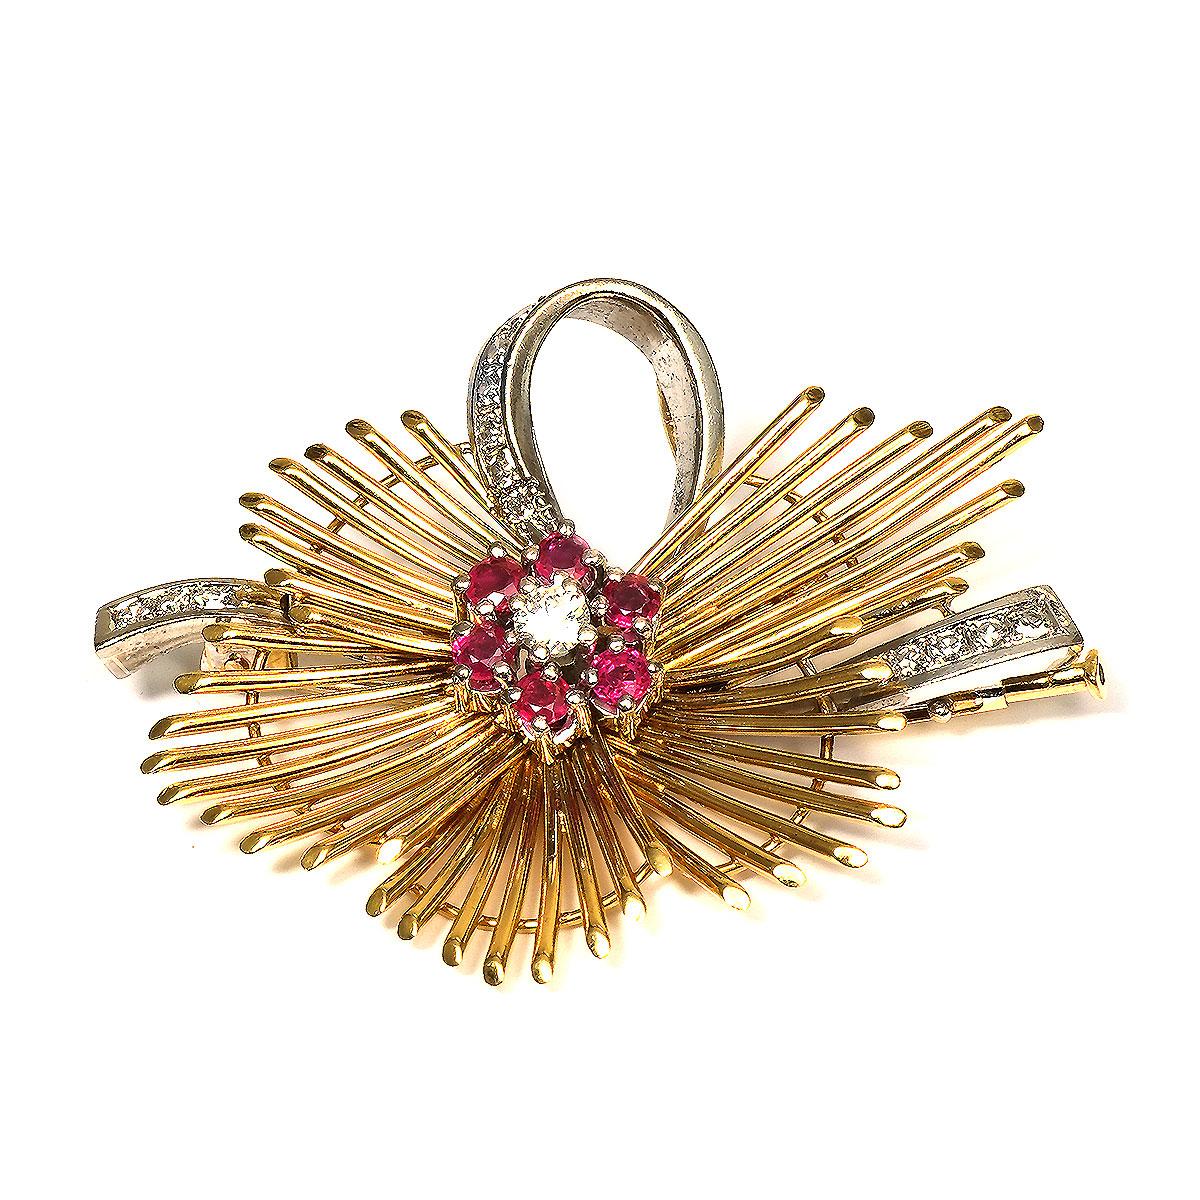 Diamanten & Edelsteine Uhren & Schmuck Perlen Brosche Diamantbrosche 585 Gold Brosche Rubin Perle Brillant Diamant